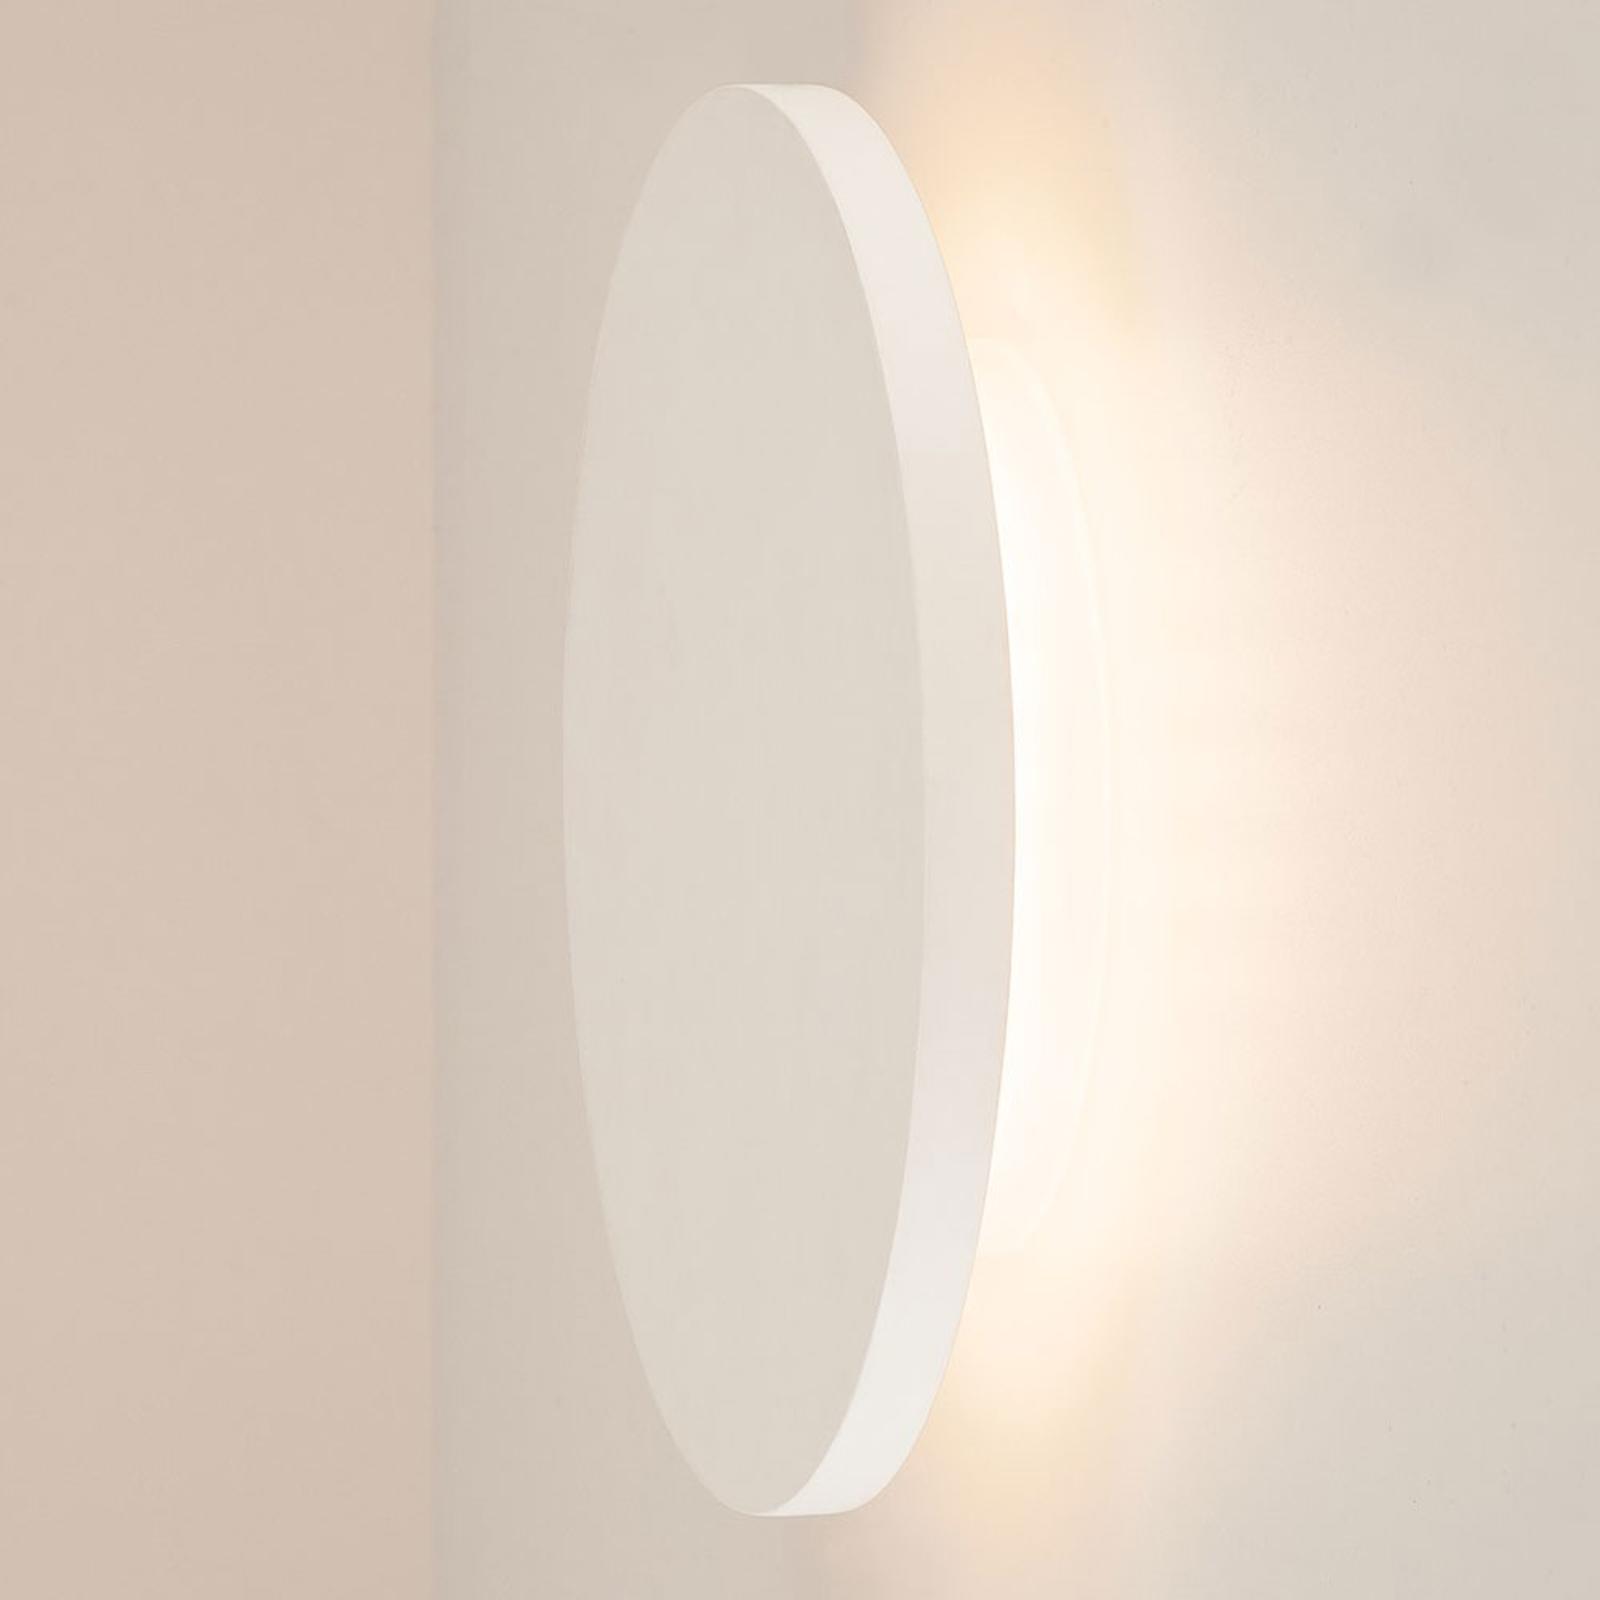 SLV Plastra LED-Wandleuchte aus Gips, rund